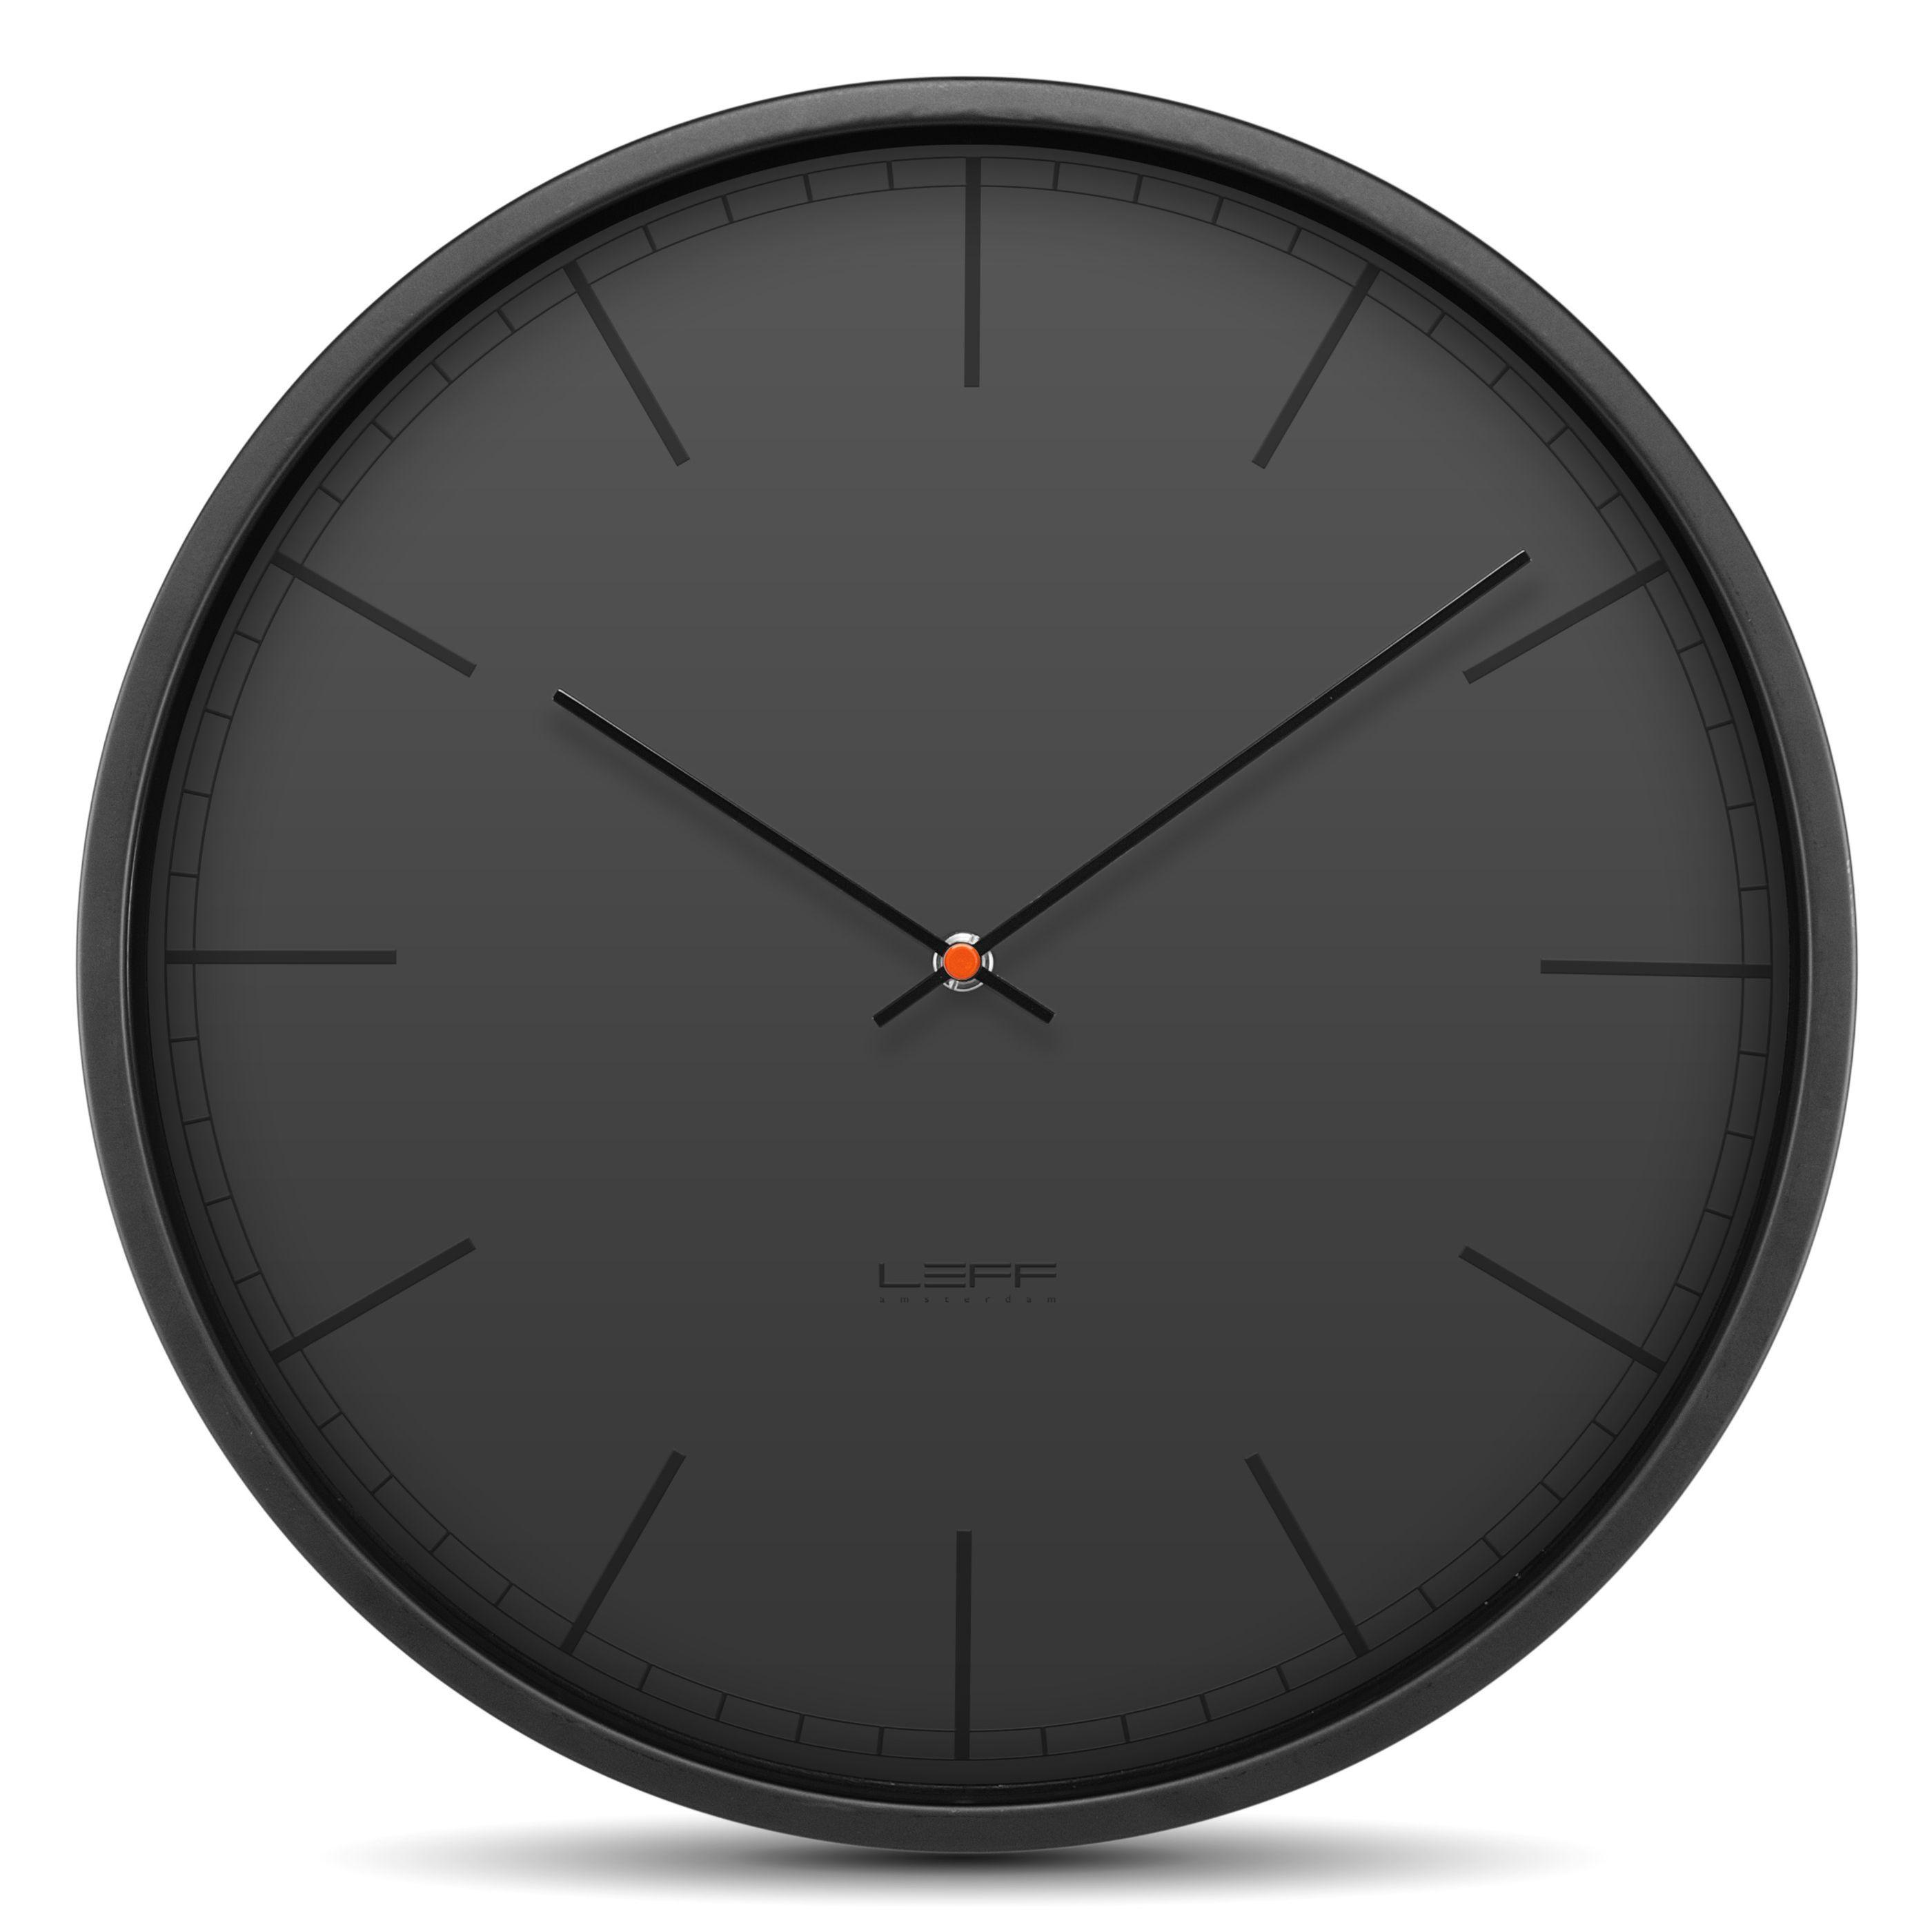 Bestellen Sie Das Produkt Auf Www Flinders De Wanduhren Wanduhr Uhrideen